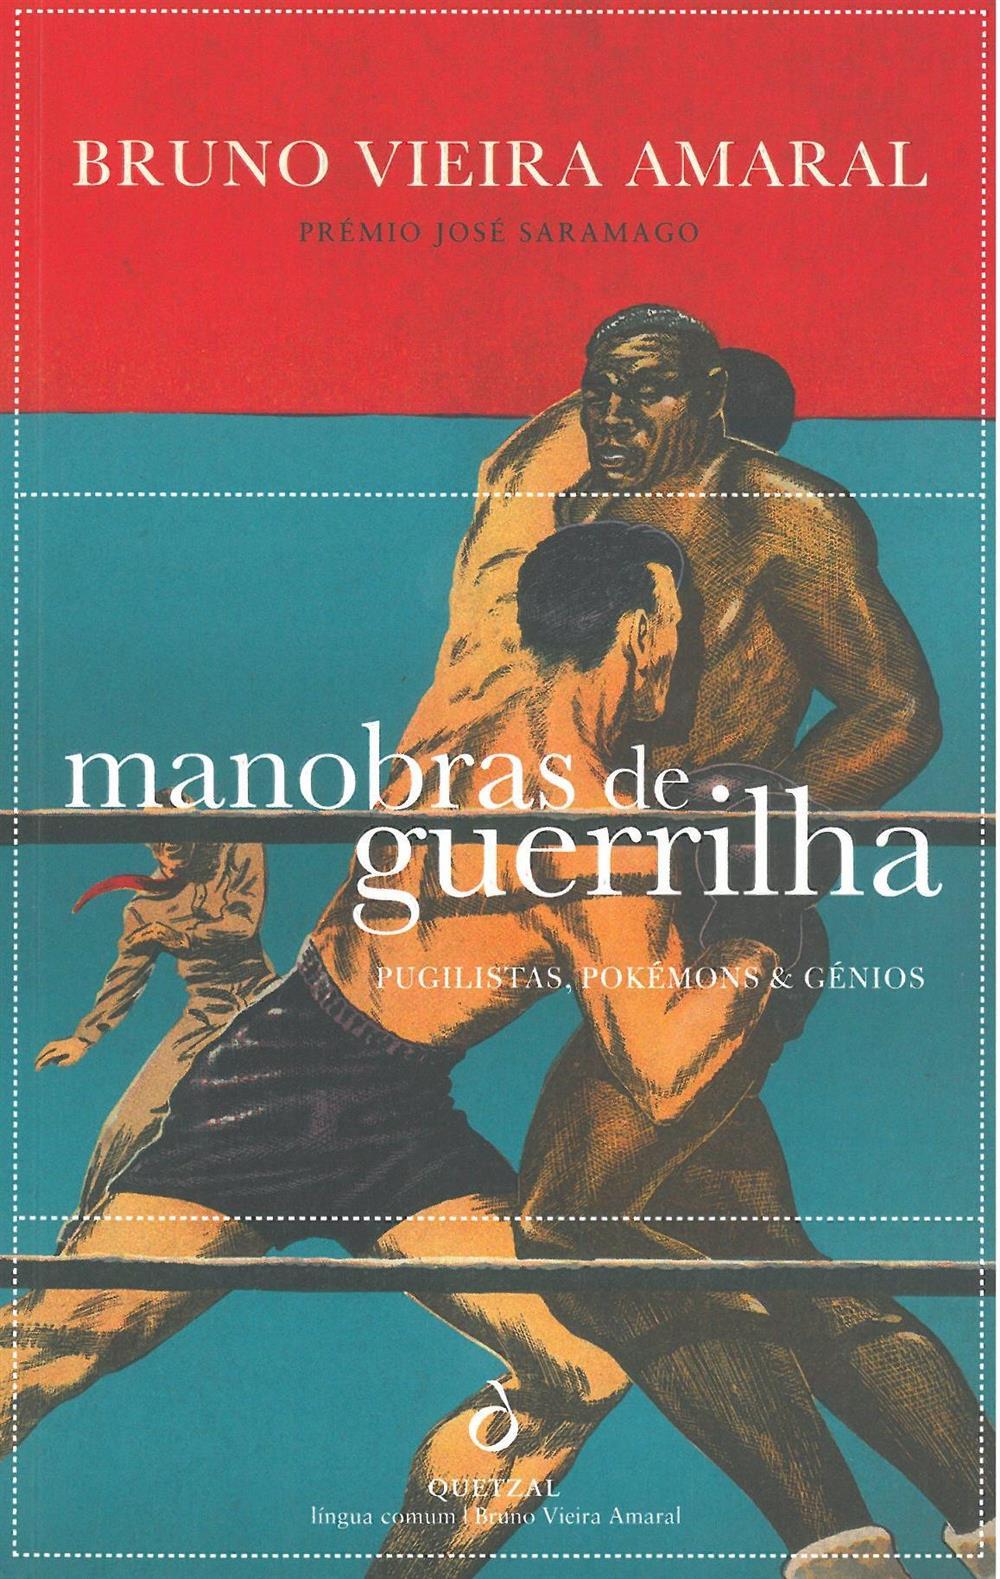 Manobras de guerrilha_.jpg